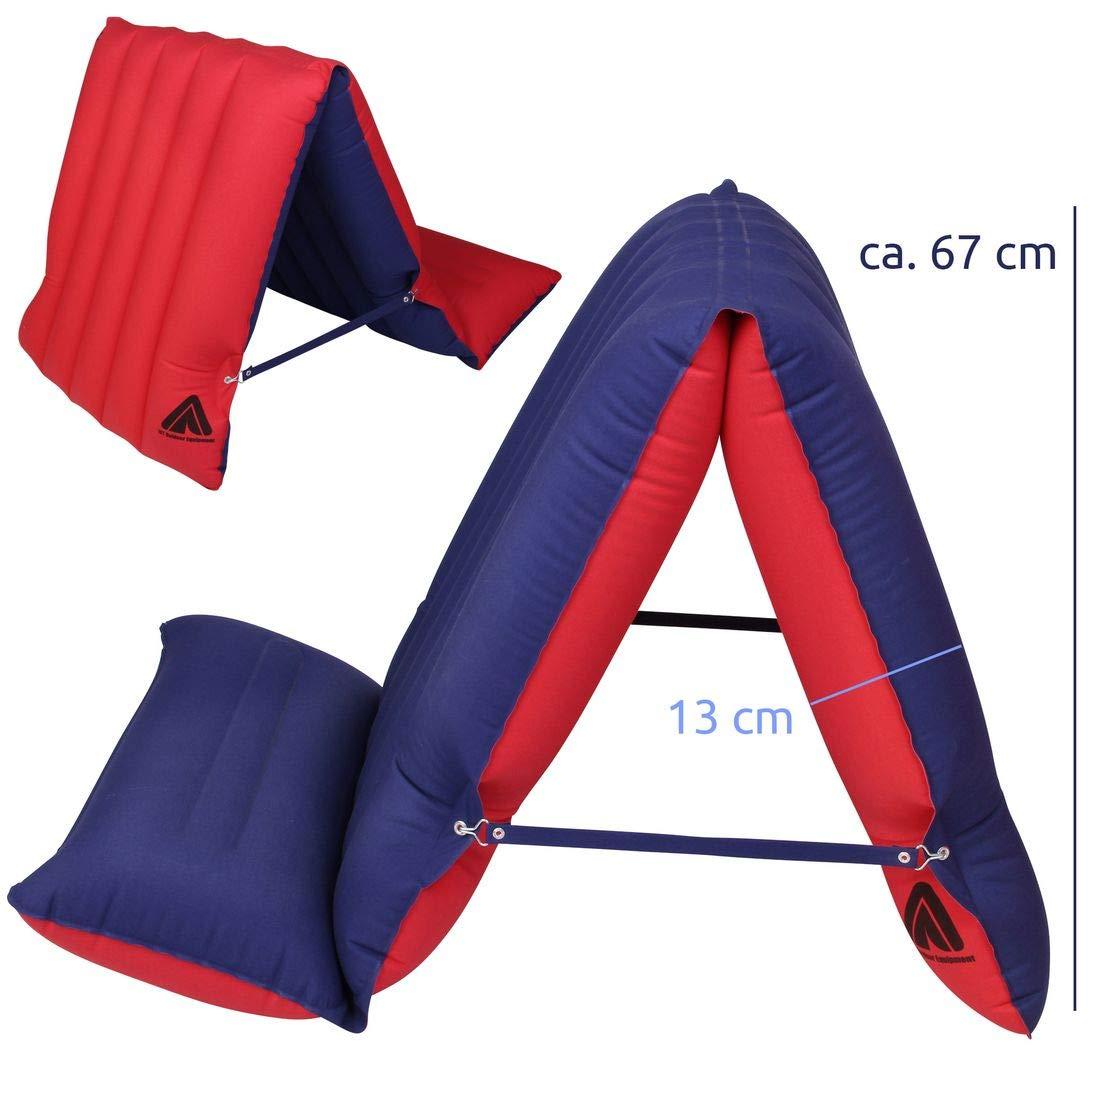 10T Outdoor Equipment Unisex Adultos Ruby Sit /& Lie 1 Hombre Cama de Aire colch/ón de algod/ón 195 x 70 cm Asiento Tumbona colch/ón de Aire Camping Rojo//Azul 1 Persona